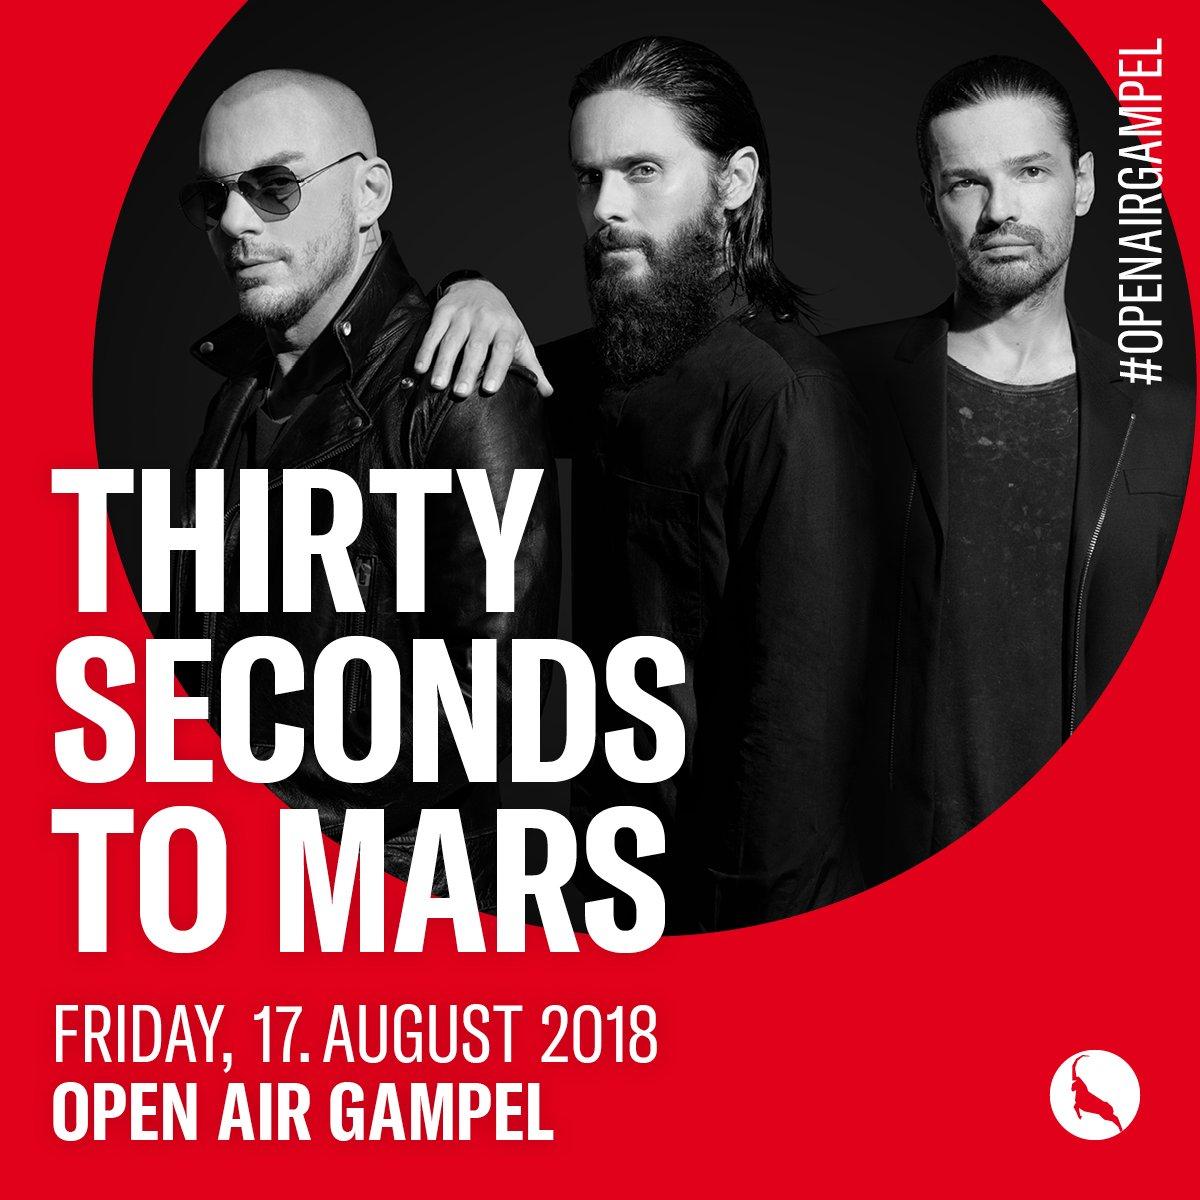 MARS IS COMING AUG 17 // OPEN AIR GAMPEL SWITZERLAND  https://t.co/STL0aru4yV  #OpenAirGampel #MonolithTour https://t.co/012MPwKzDw